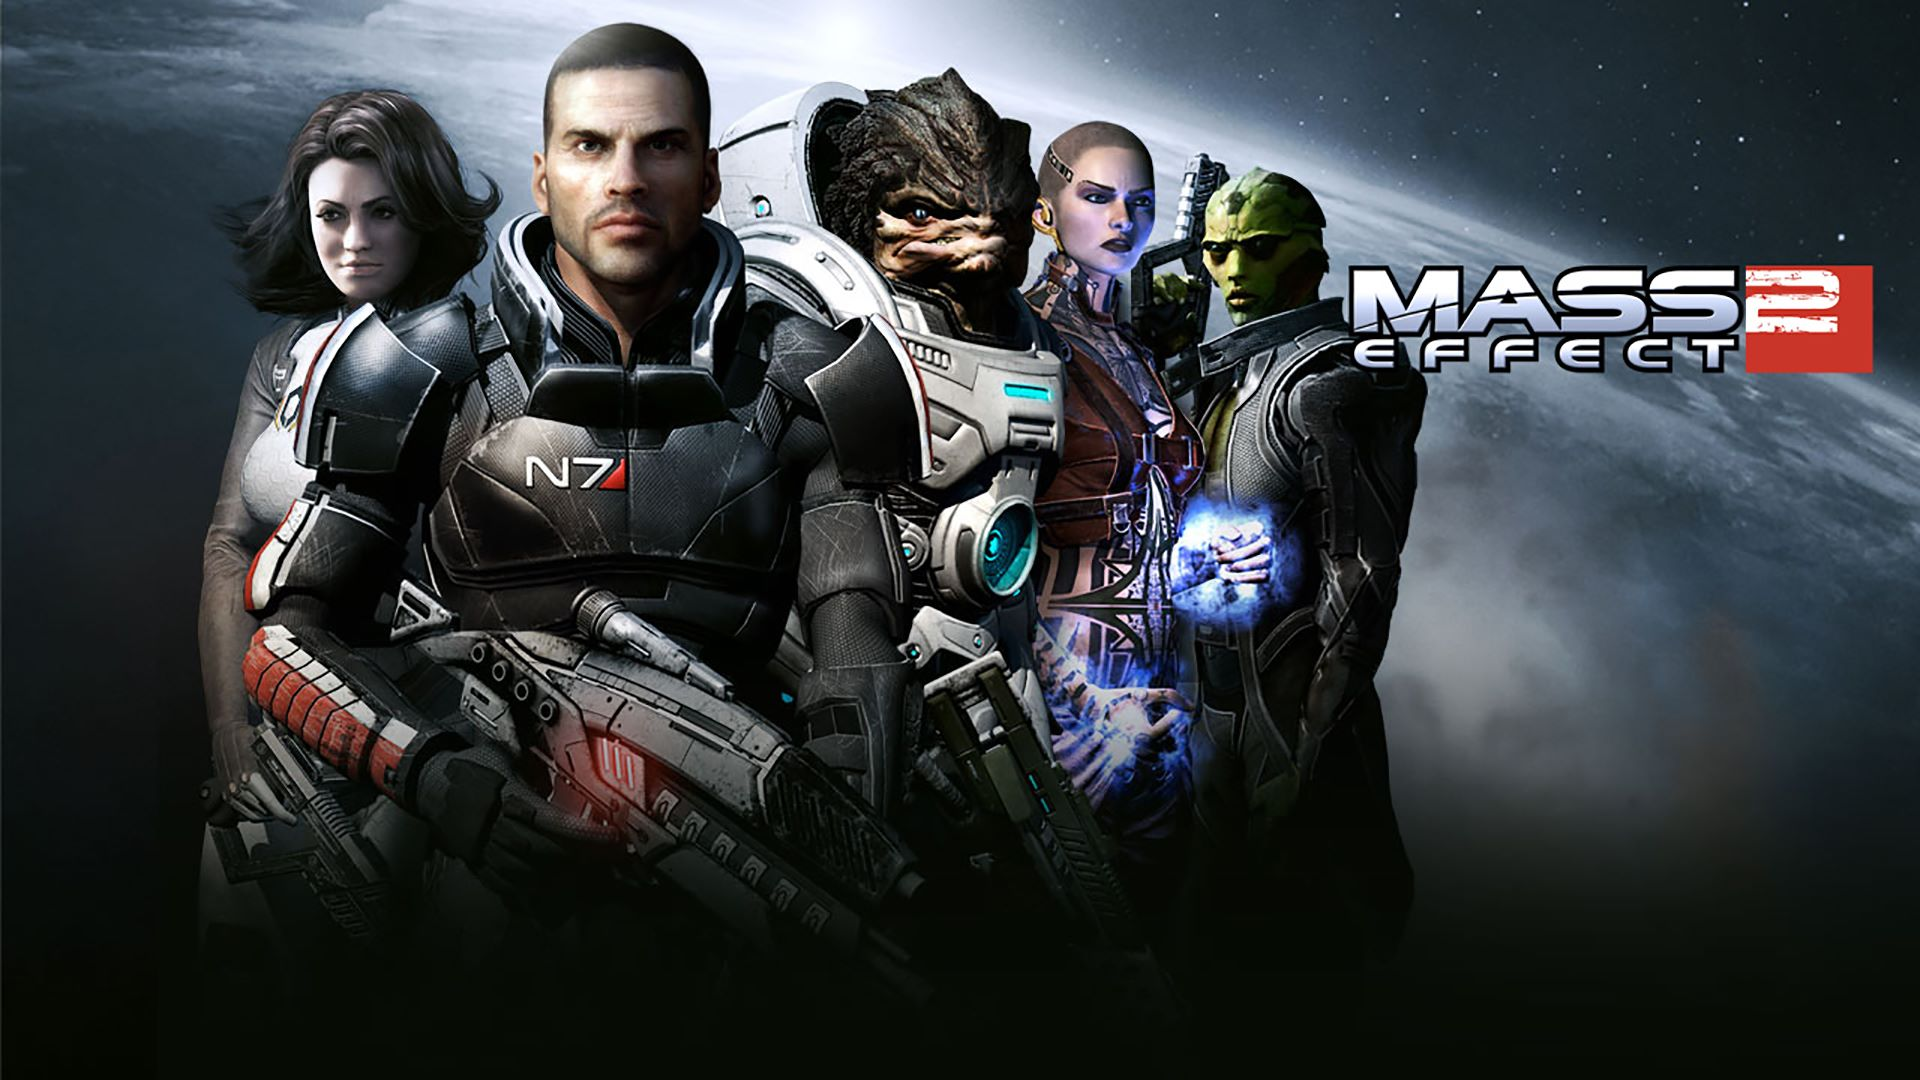 Mass Effect of Thrones 2